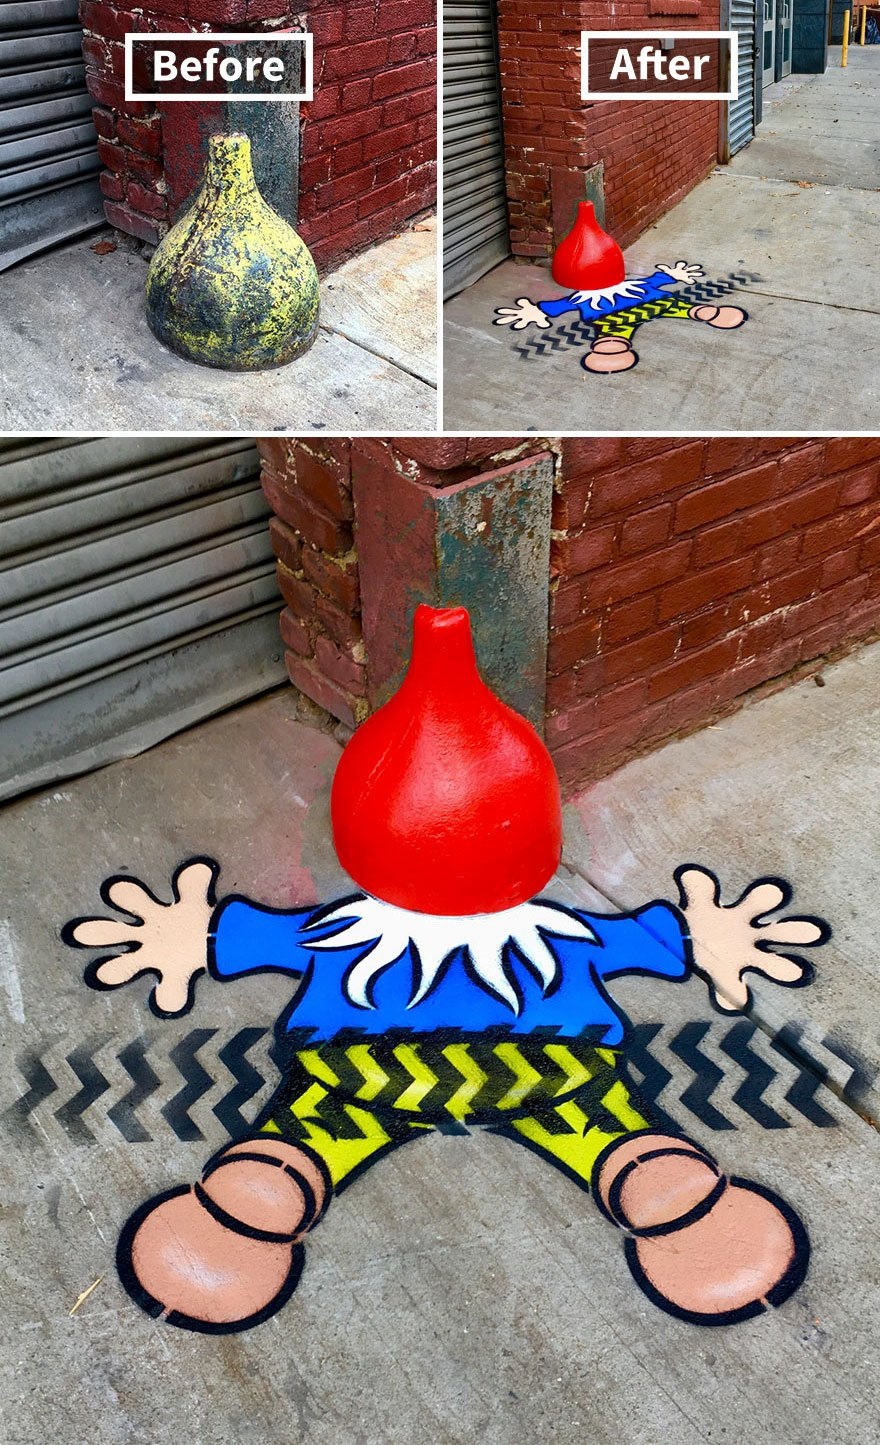 Gnome Down (Brooklyn)